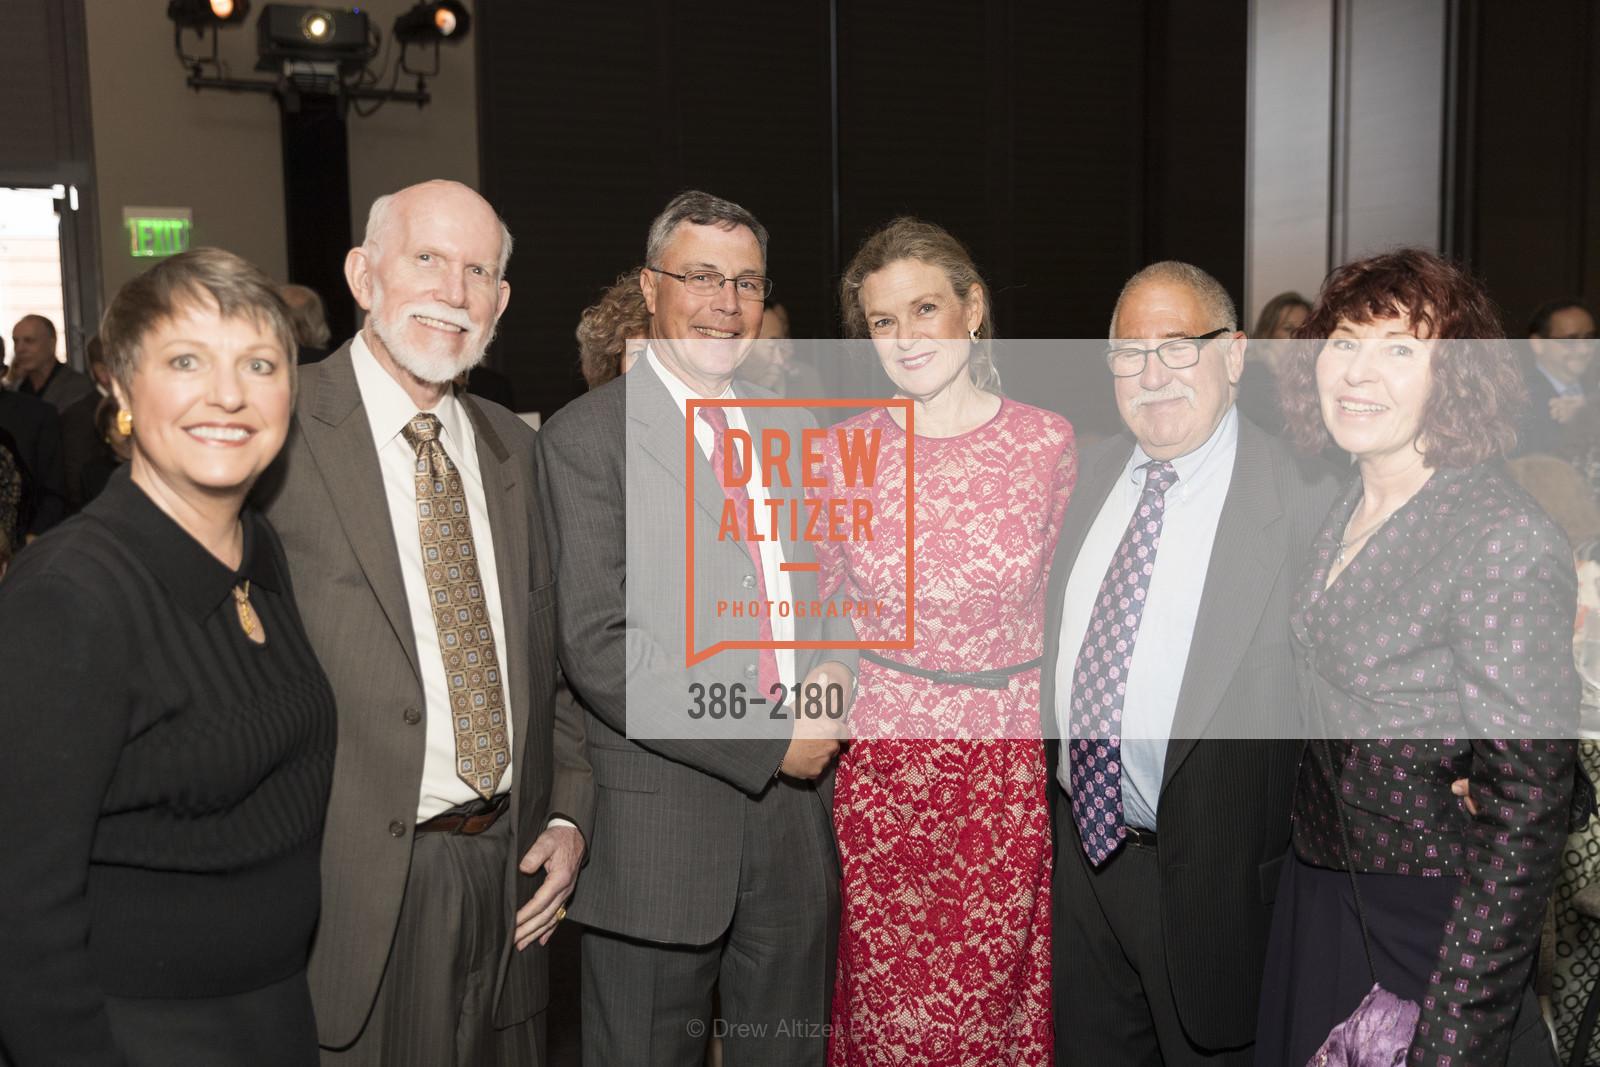 Janet Cluff, Lloyd Cluff, John Shott, Heidi Munzinger, Gary Glaser, Christine Miller, Photo #386-2180